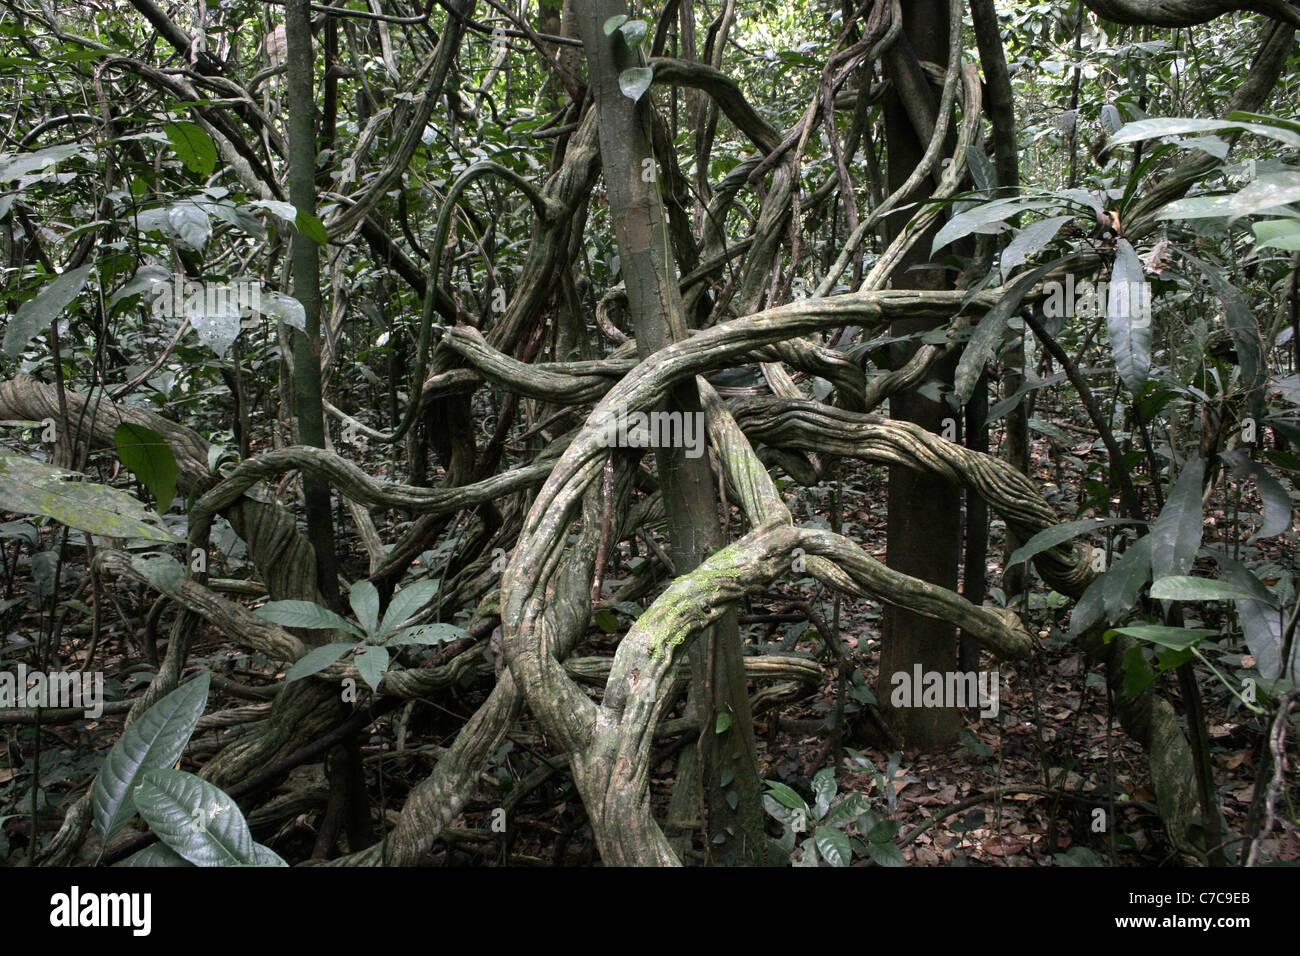 Tangle of lianas in rainforest, Korup, Cameroon. - Stock Image